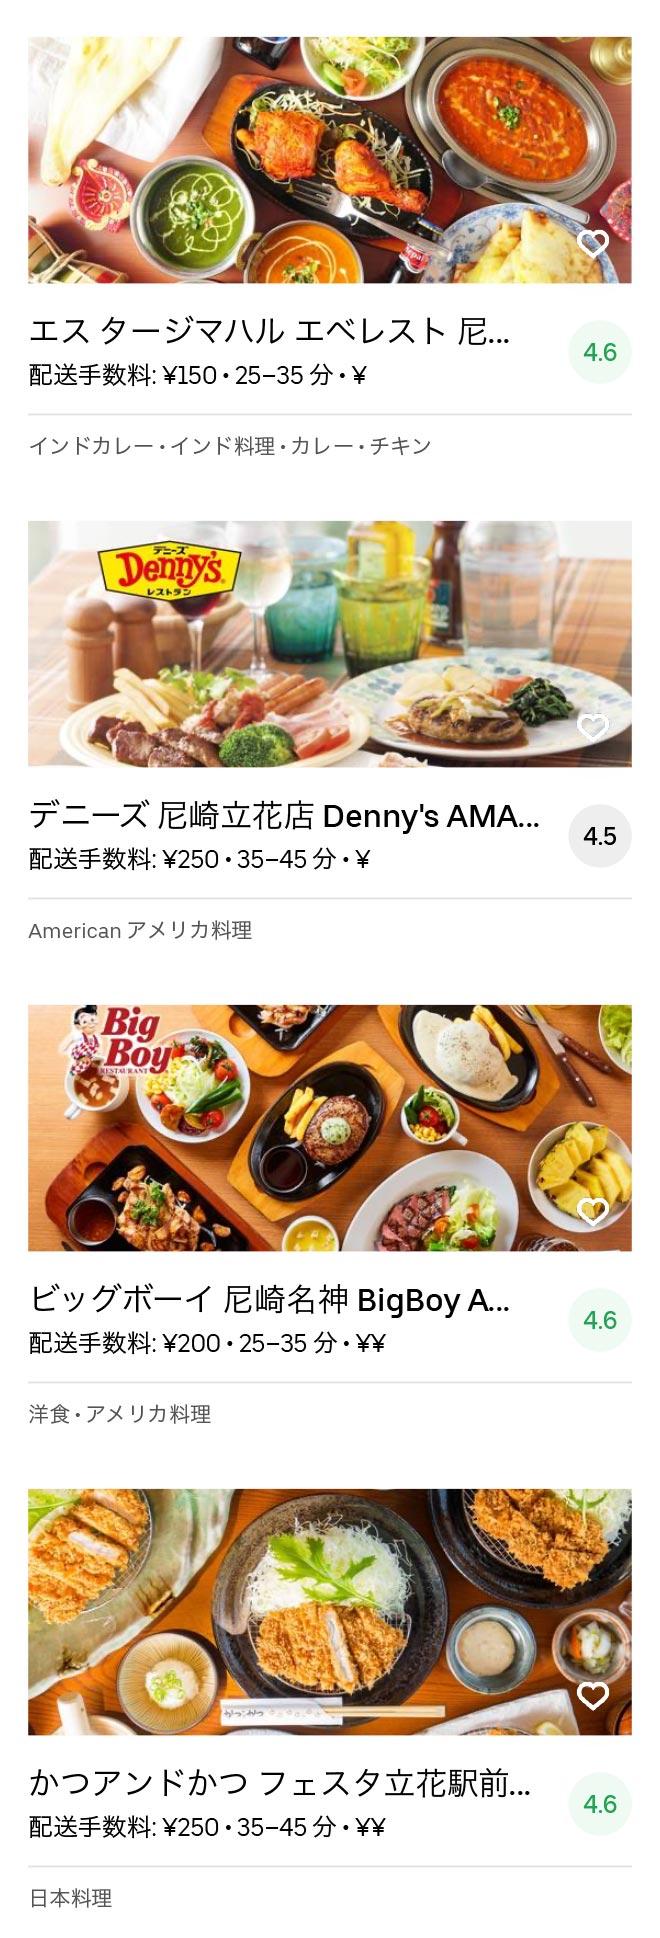 Amagasaki menu 2005 09